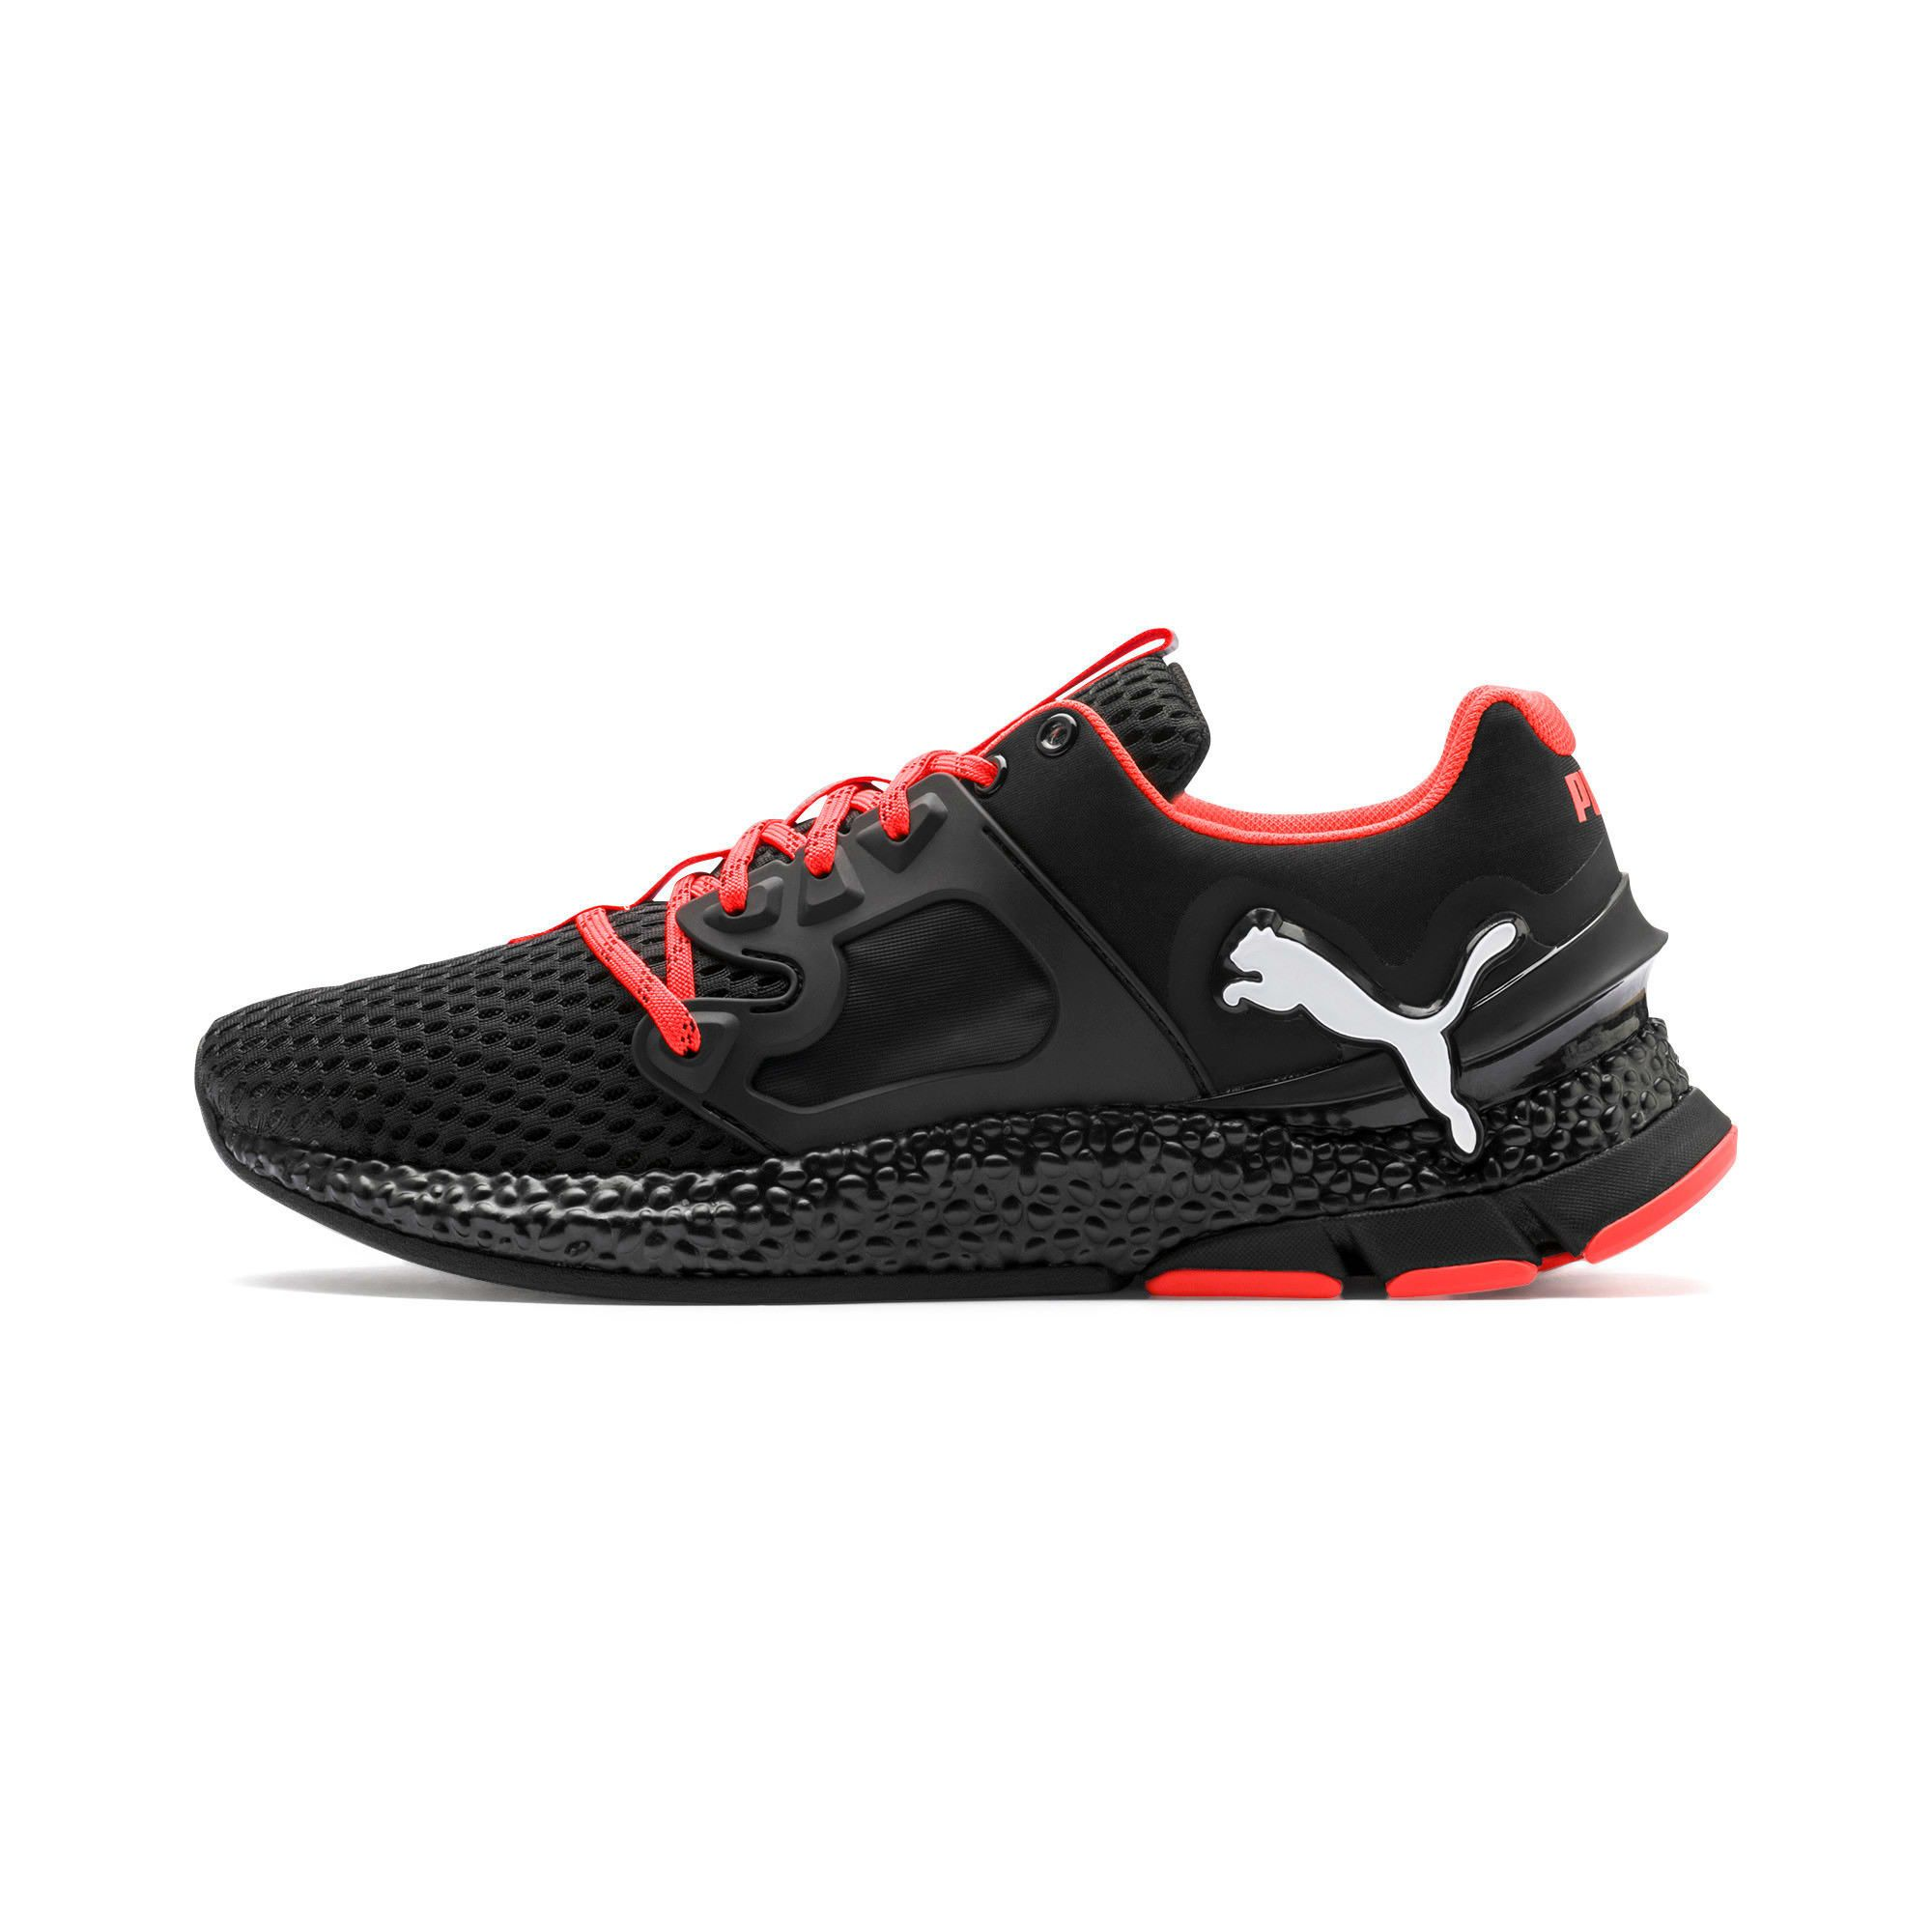 Chaussure de course HYBRID Sky pour homme | Running shoes ...